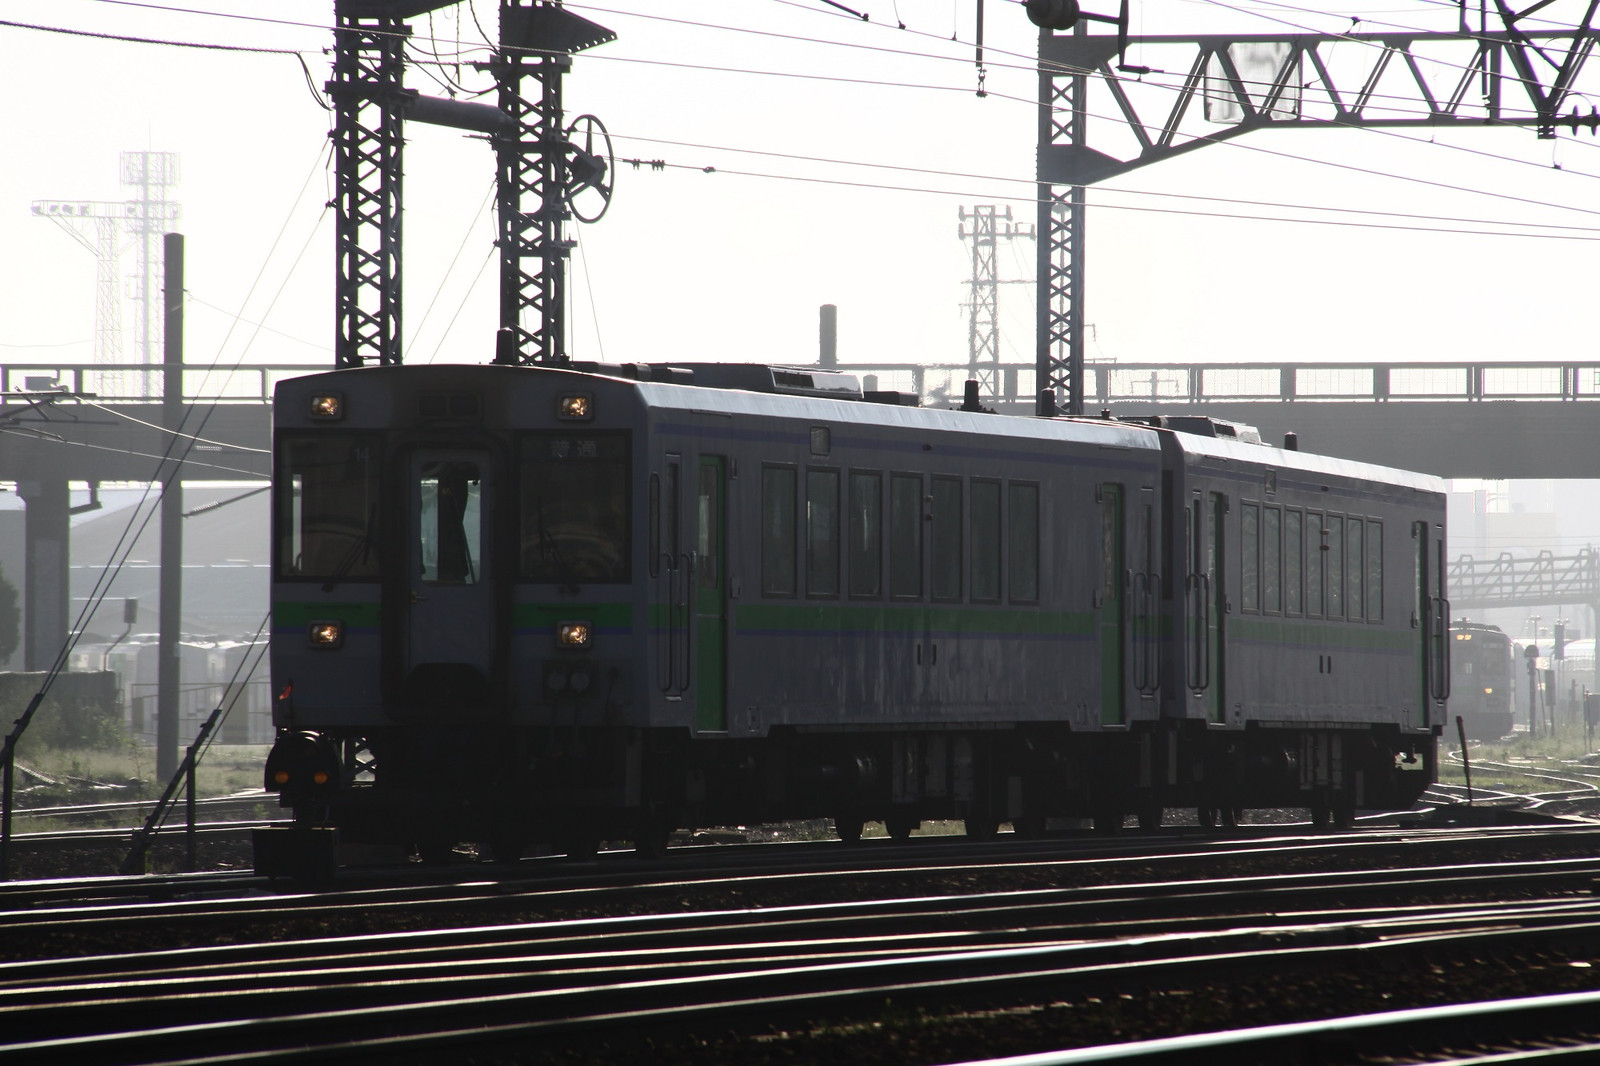 Jr1508020001